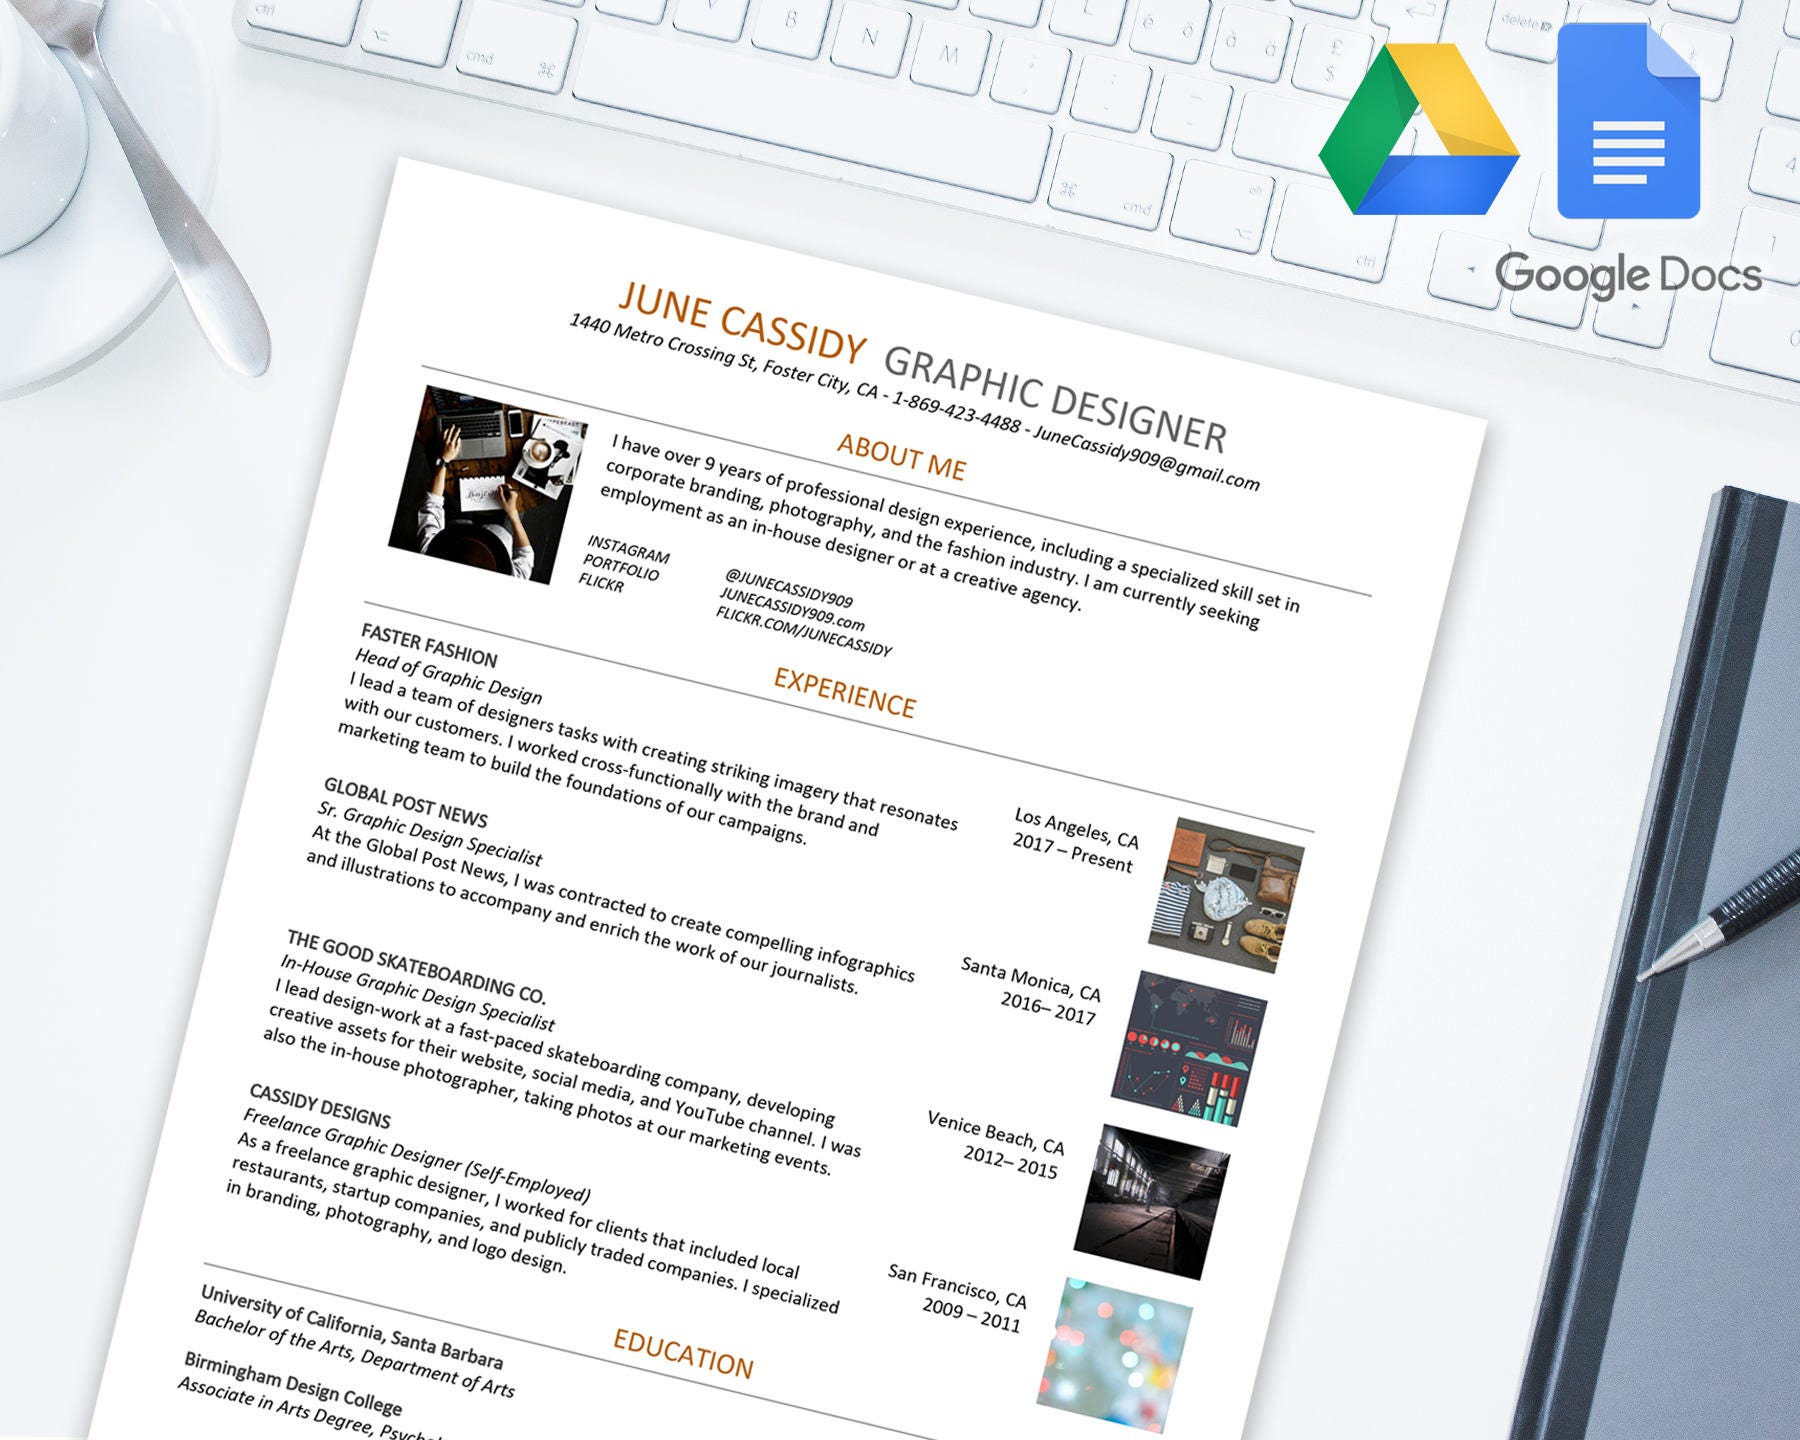 Kreative Lebenslauf Vorlage für Google Docs | Google Drive | Microsoft Word  .docx